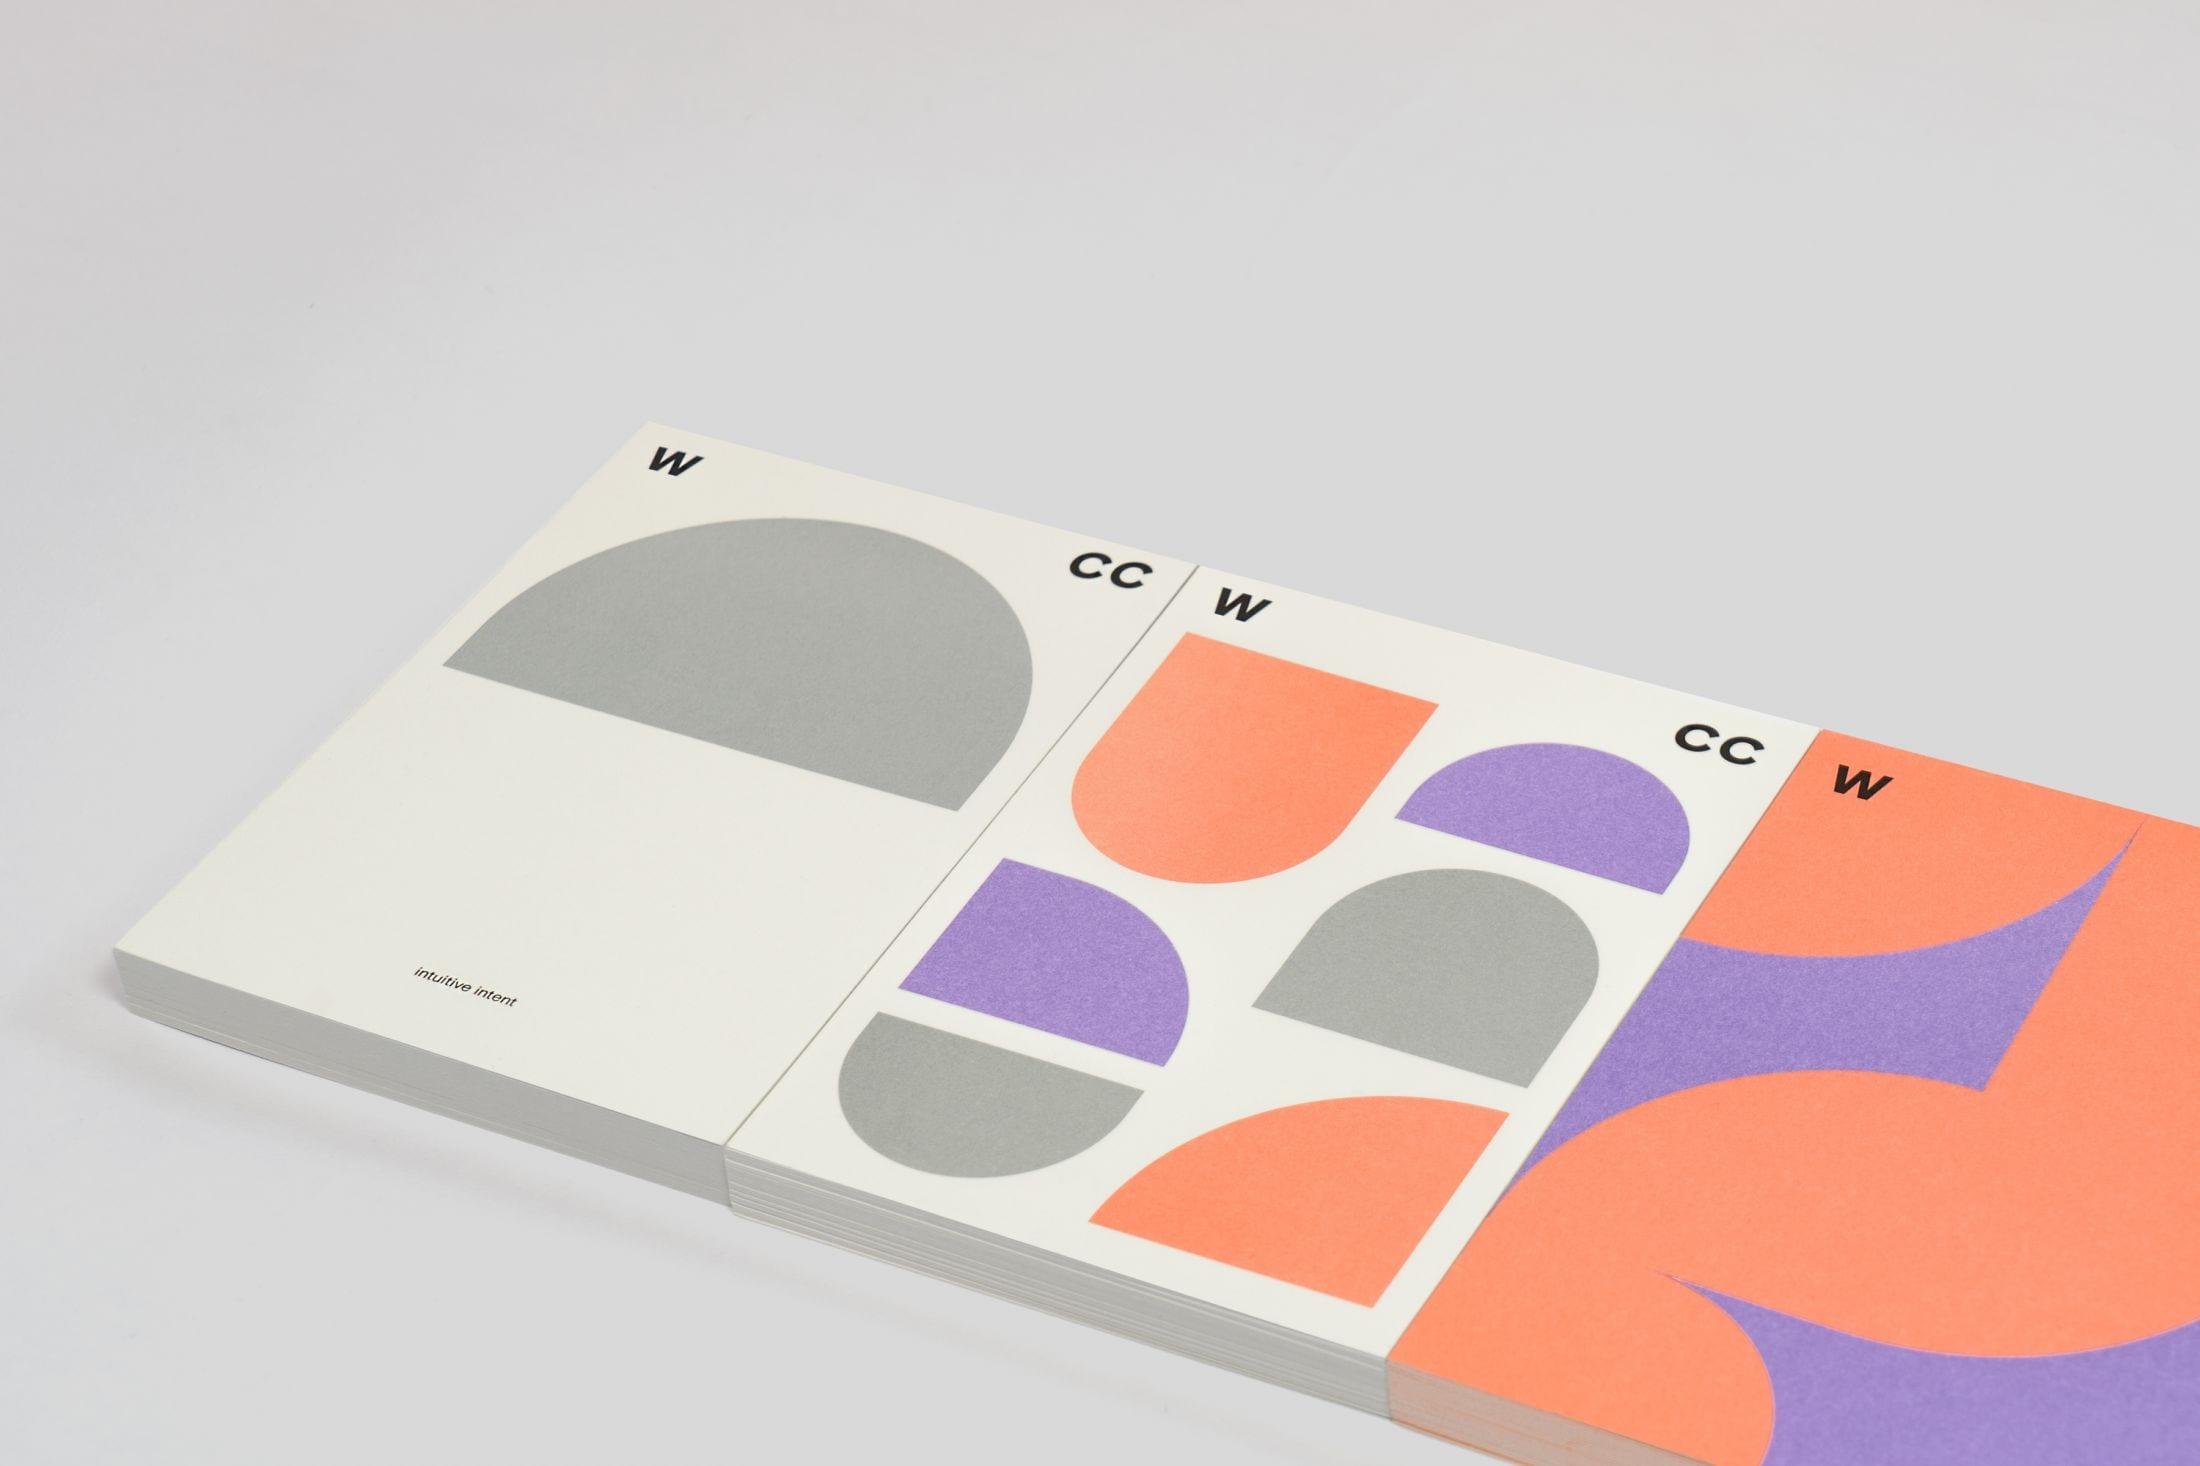 a2bfa1313b0f791f4c716e6076fa78c3f3d7b07b 2200 2 - Nová geometrická vizuální identita a web pro Women's Creative Collective